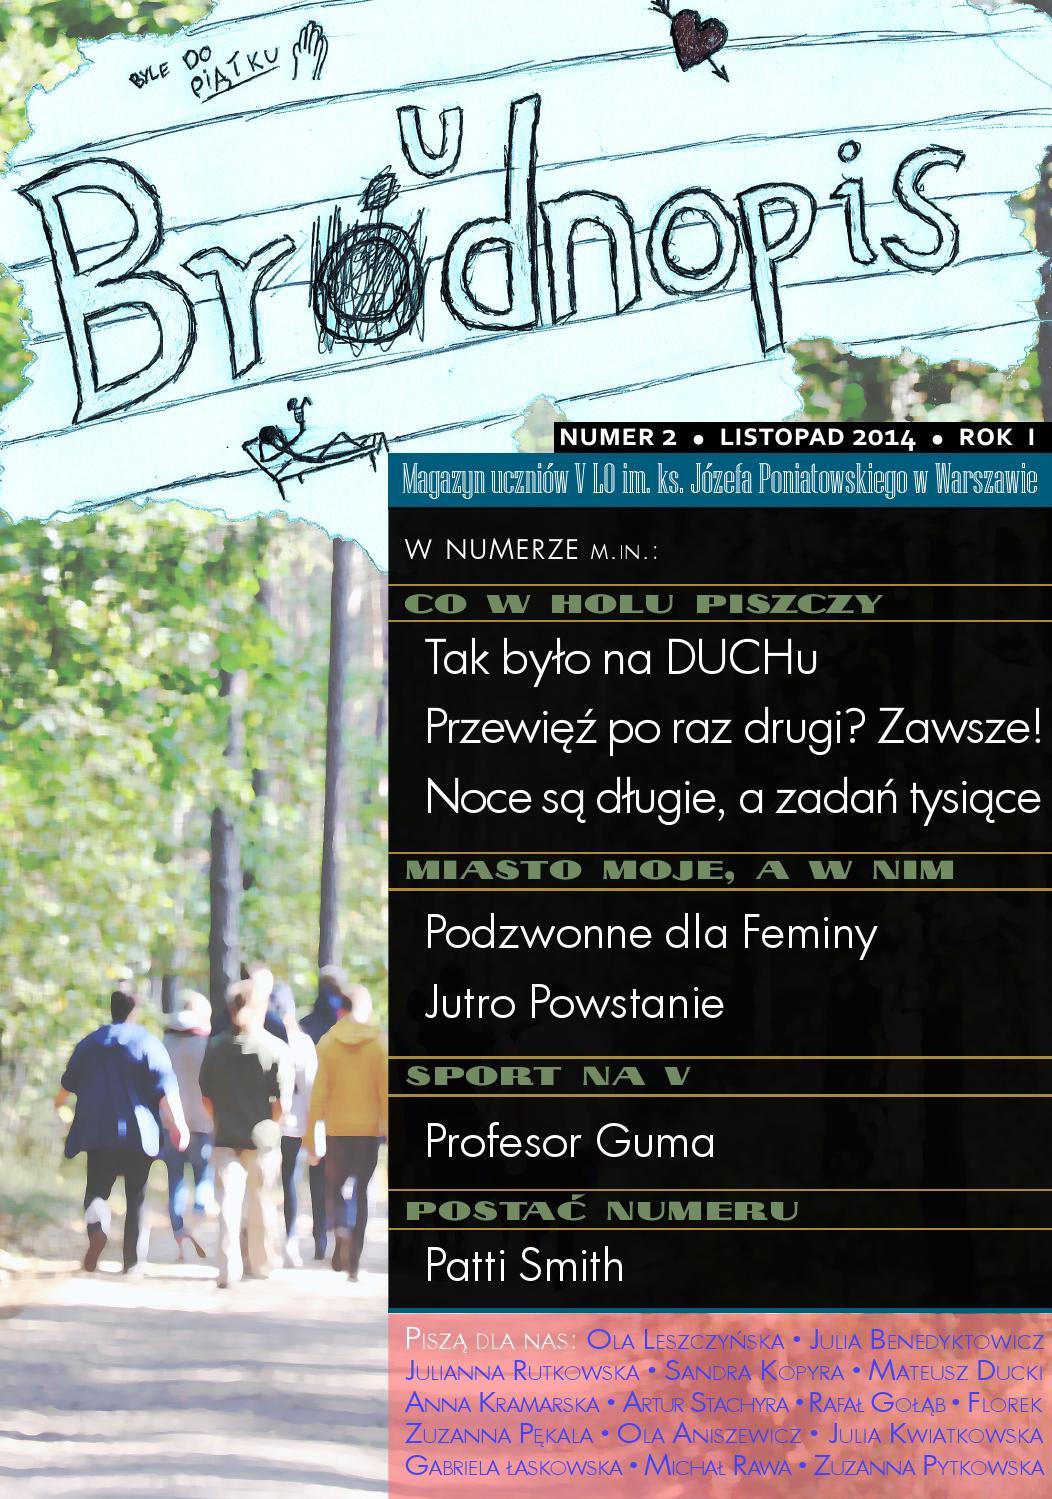 Brudnopis numer 2 by Brudnopis Magazyn VLO issuu